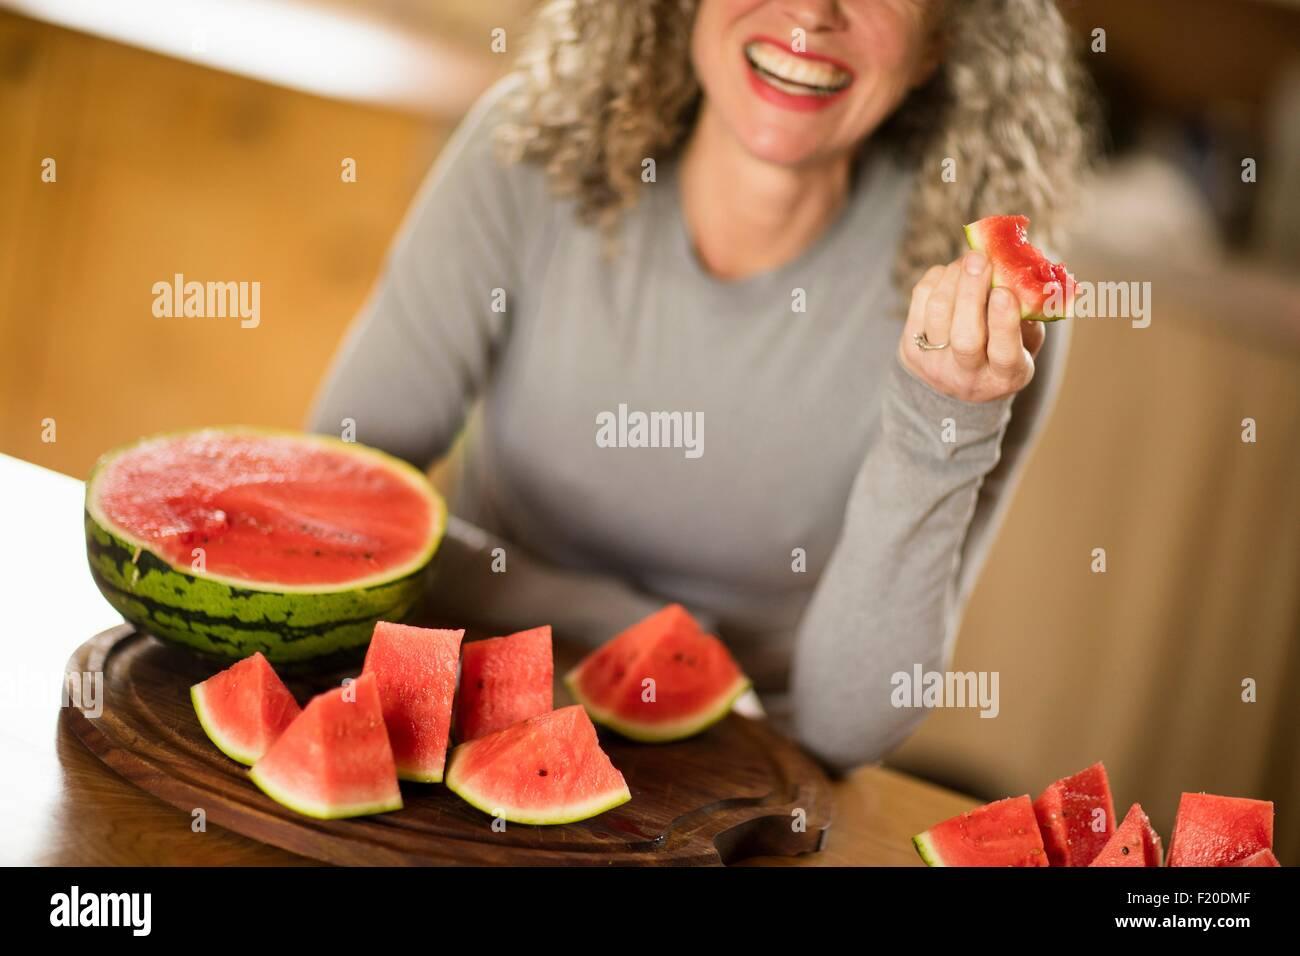 Reife Frau Essen Wassermelone in Küche Stockbild